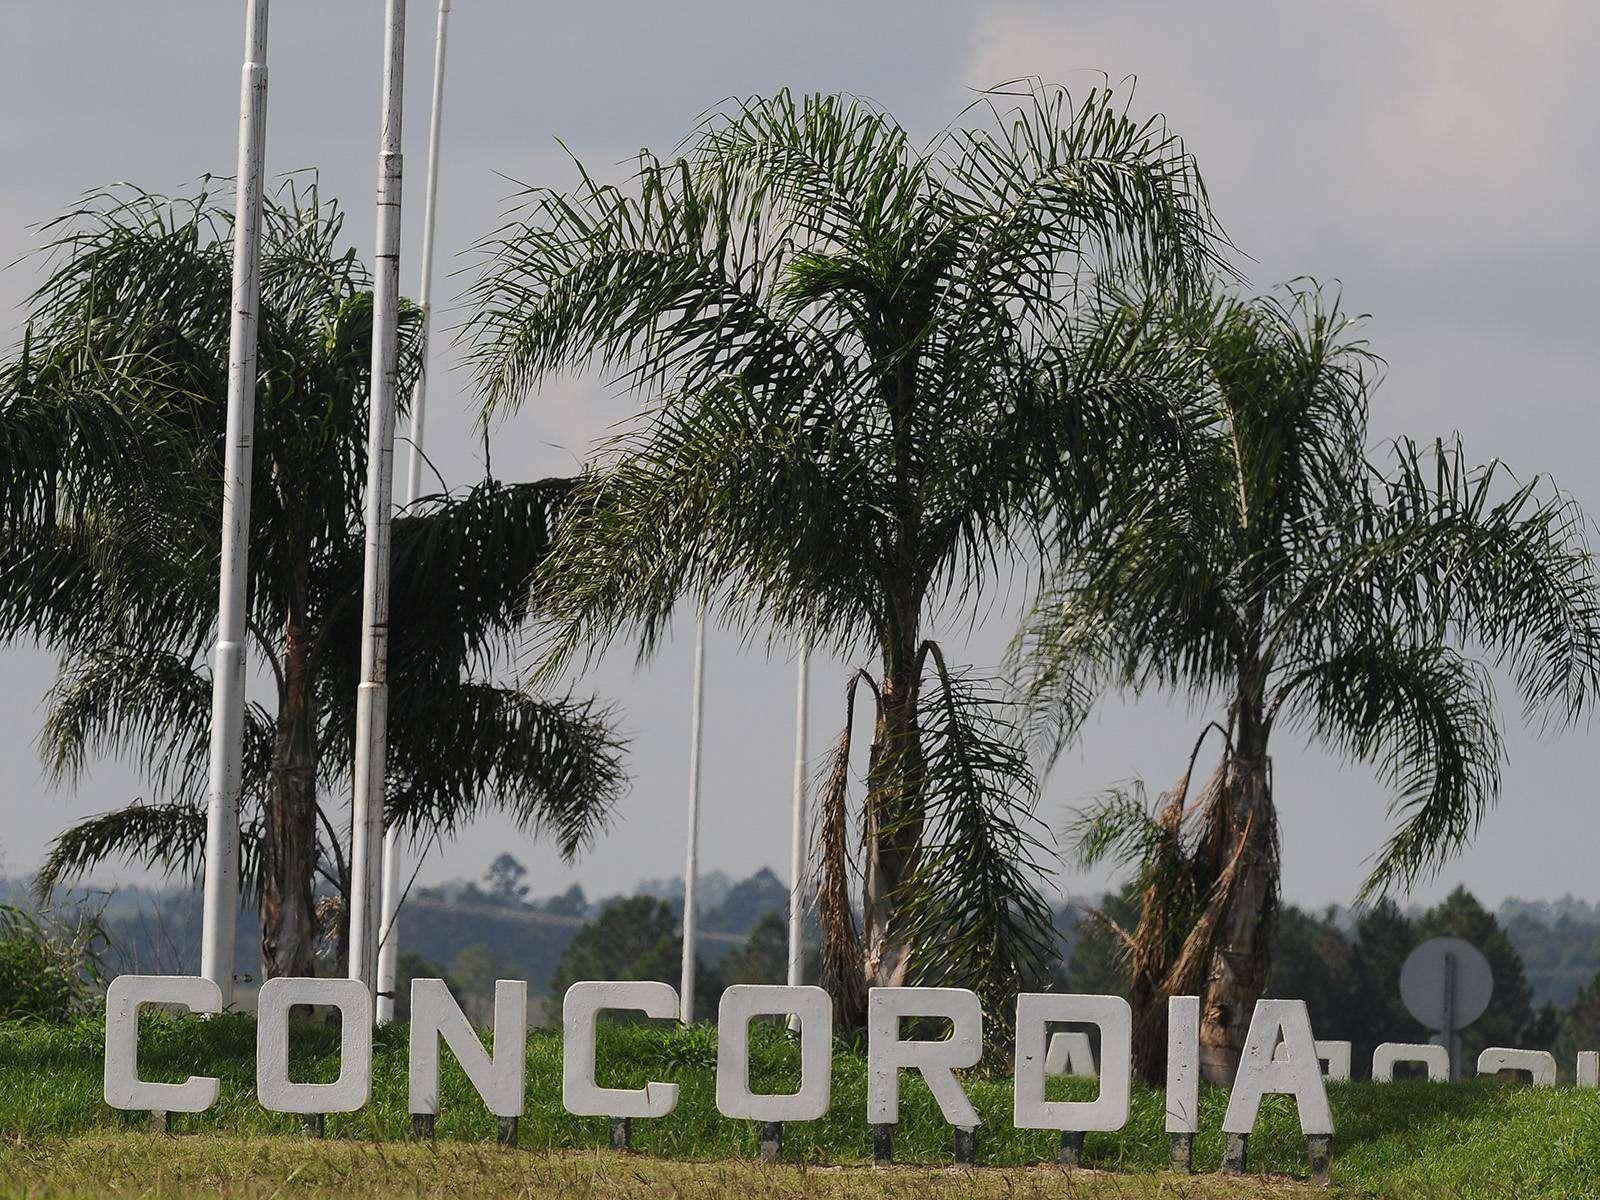 Comienza la promo #TNenConcordia